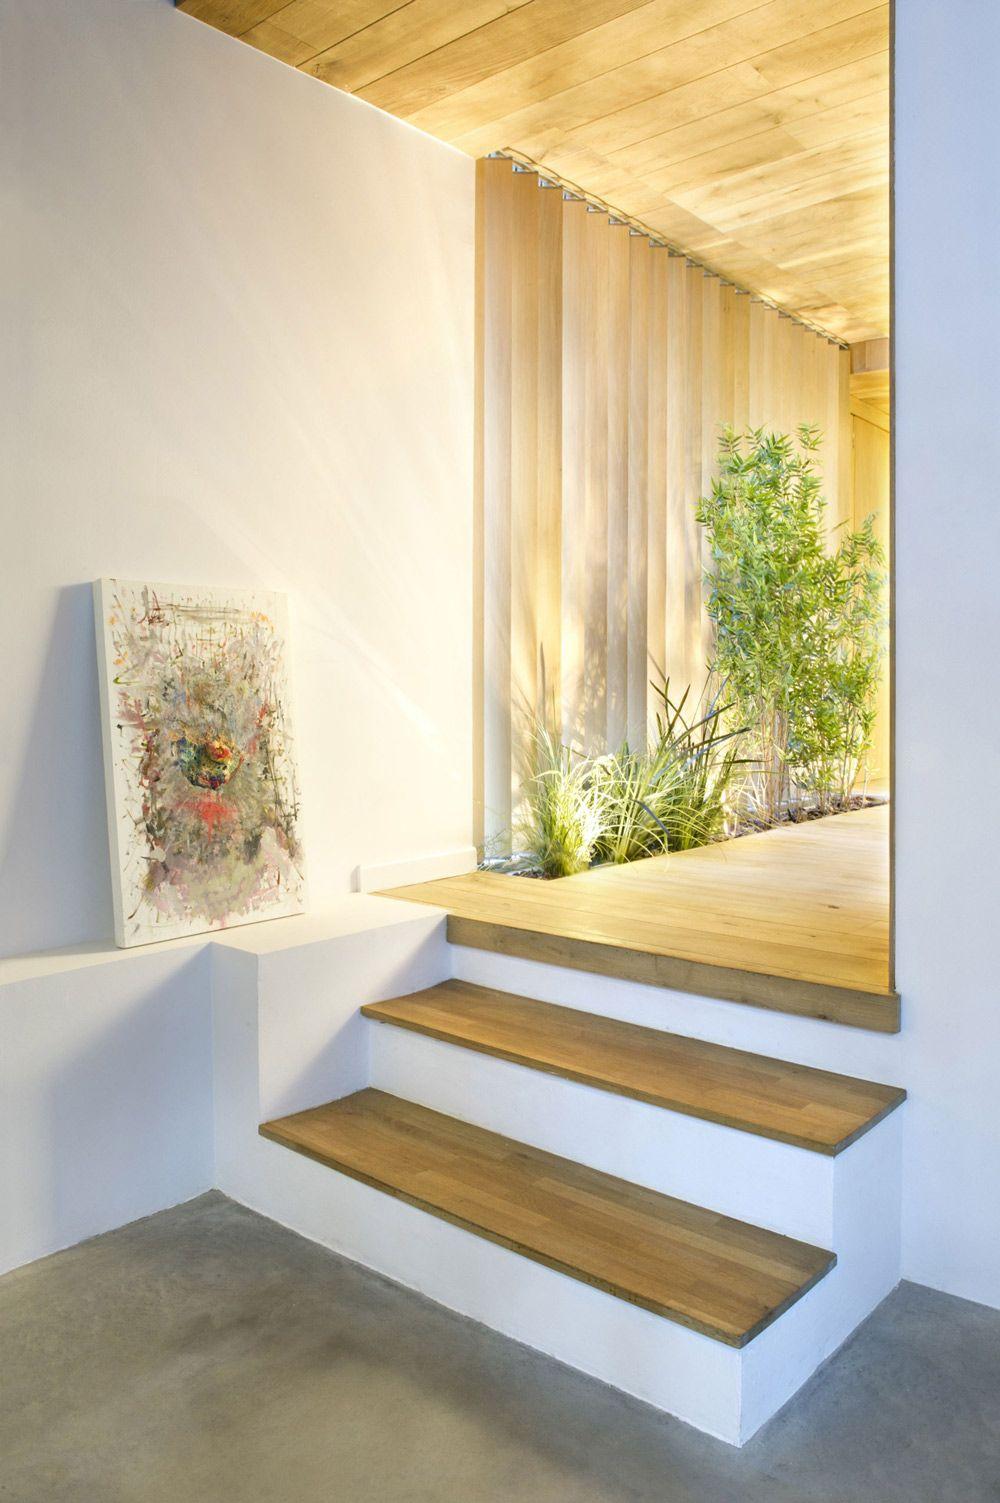 Steps, Entrance Hall, Loft Style Home in Terrassa, Spain | Interior ...